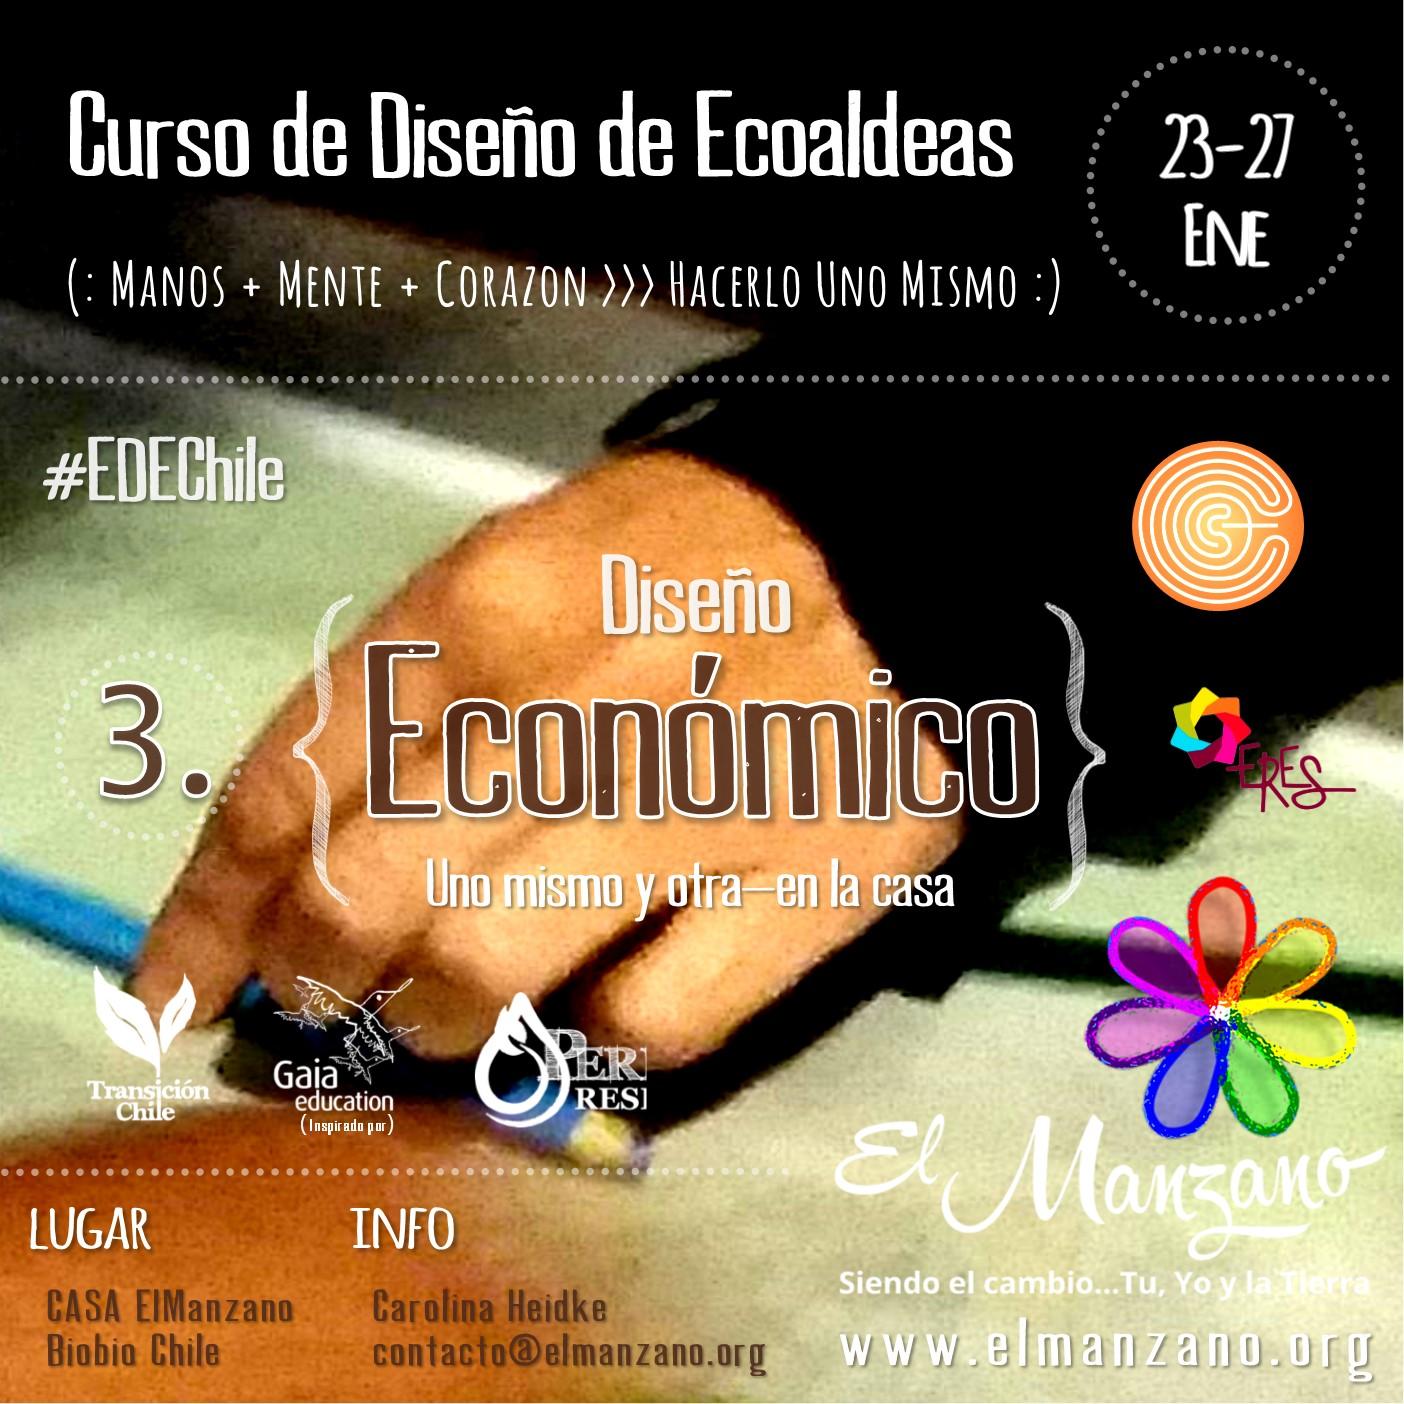 permacultura-diseno-regenerativo-ecoaldeas-el-manzano-chile-6-small